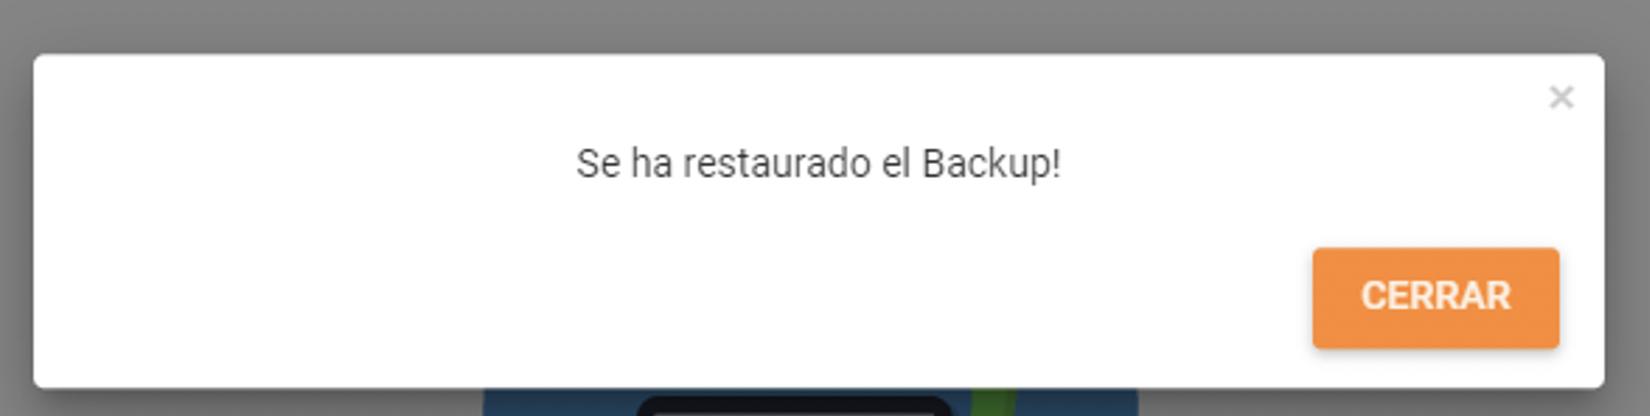 backup restaurado